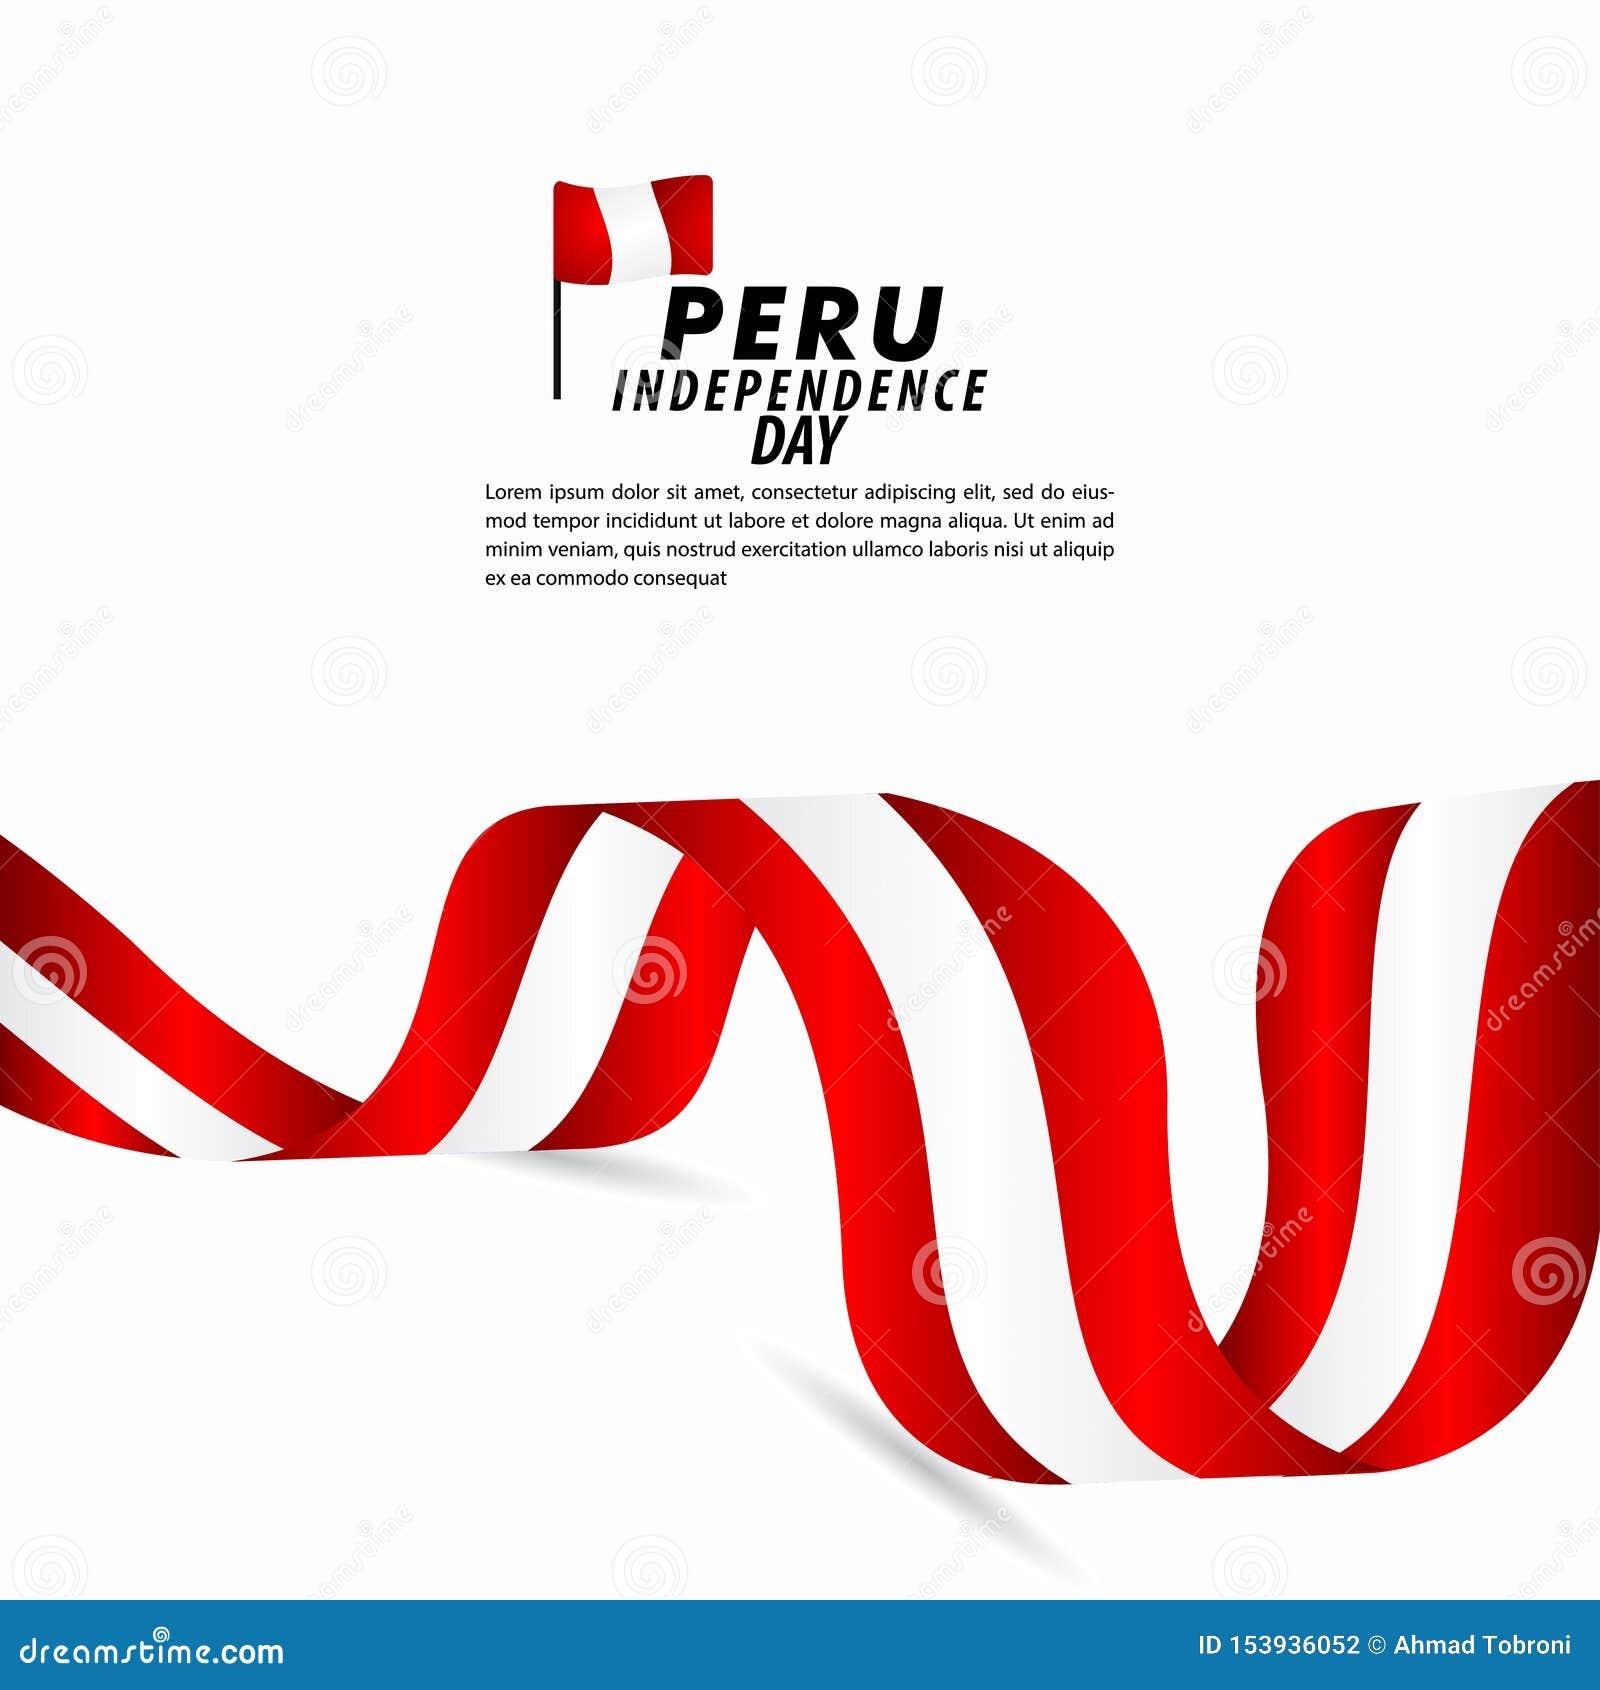 Peru Independence Day Celebration Vector Template Design Illustration Stock Vector Illustration Of Happy Peru 153936052